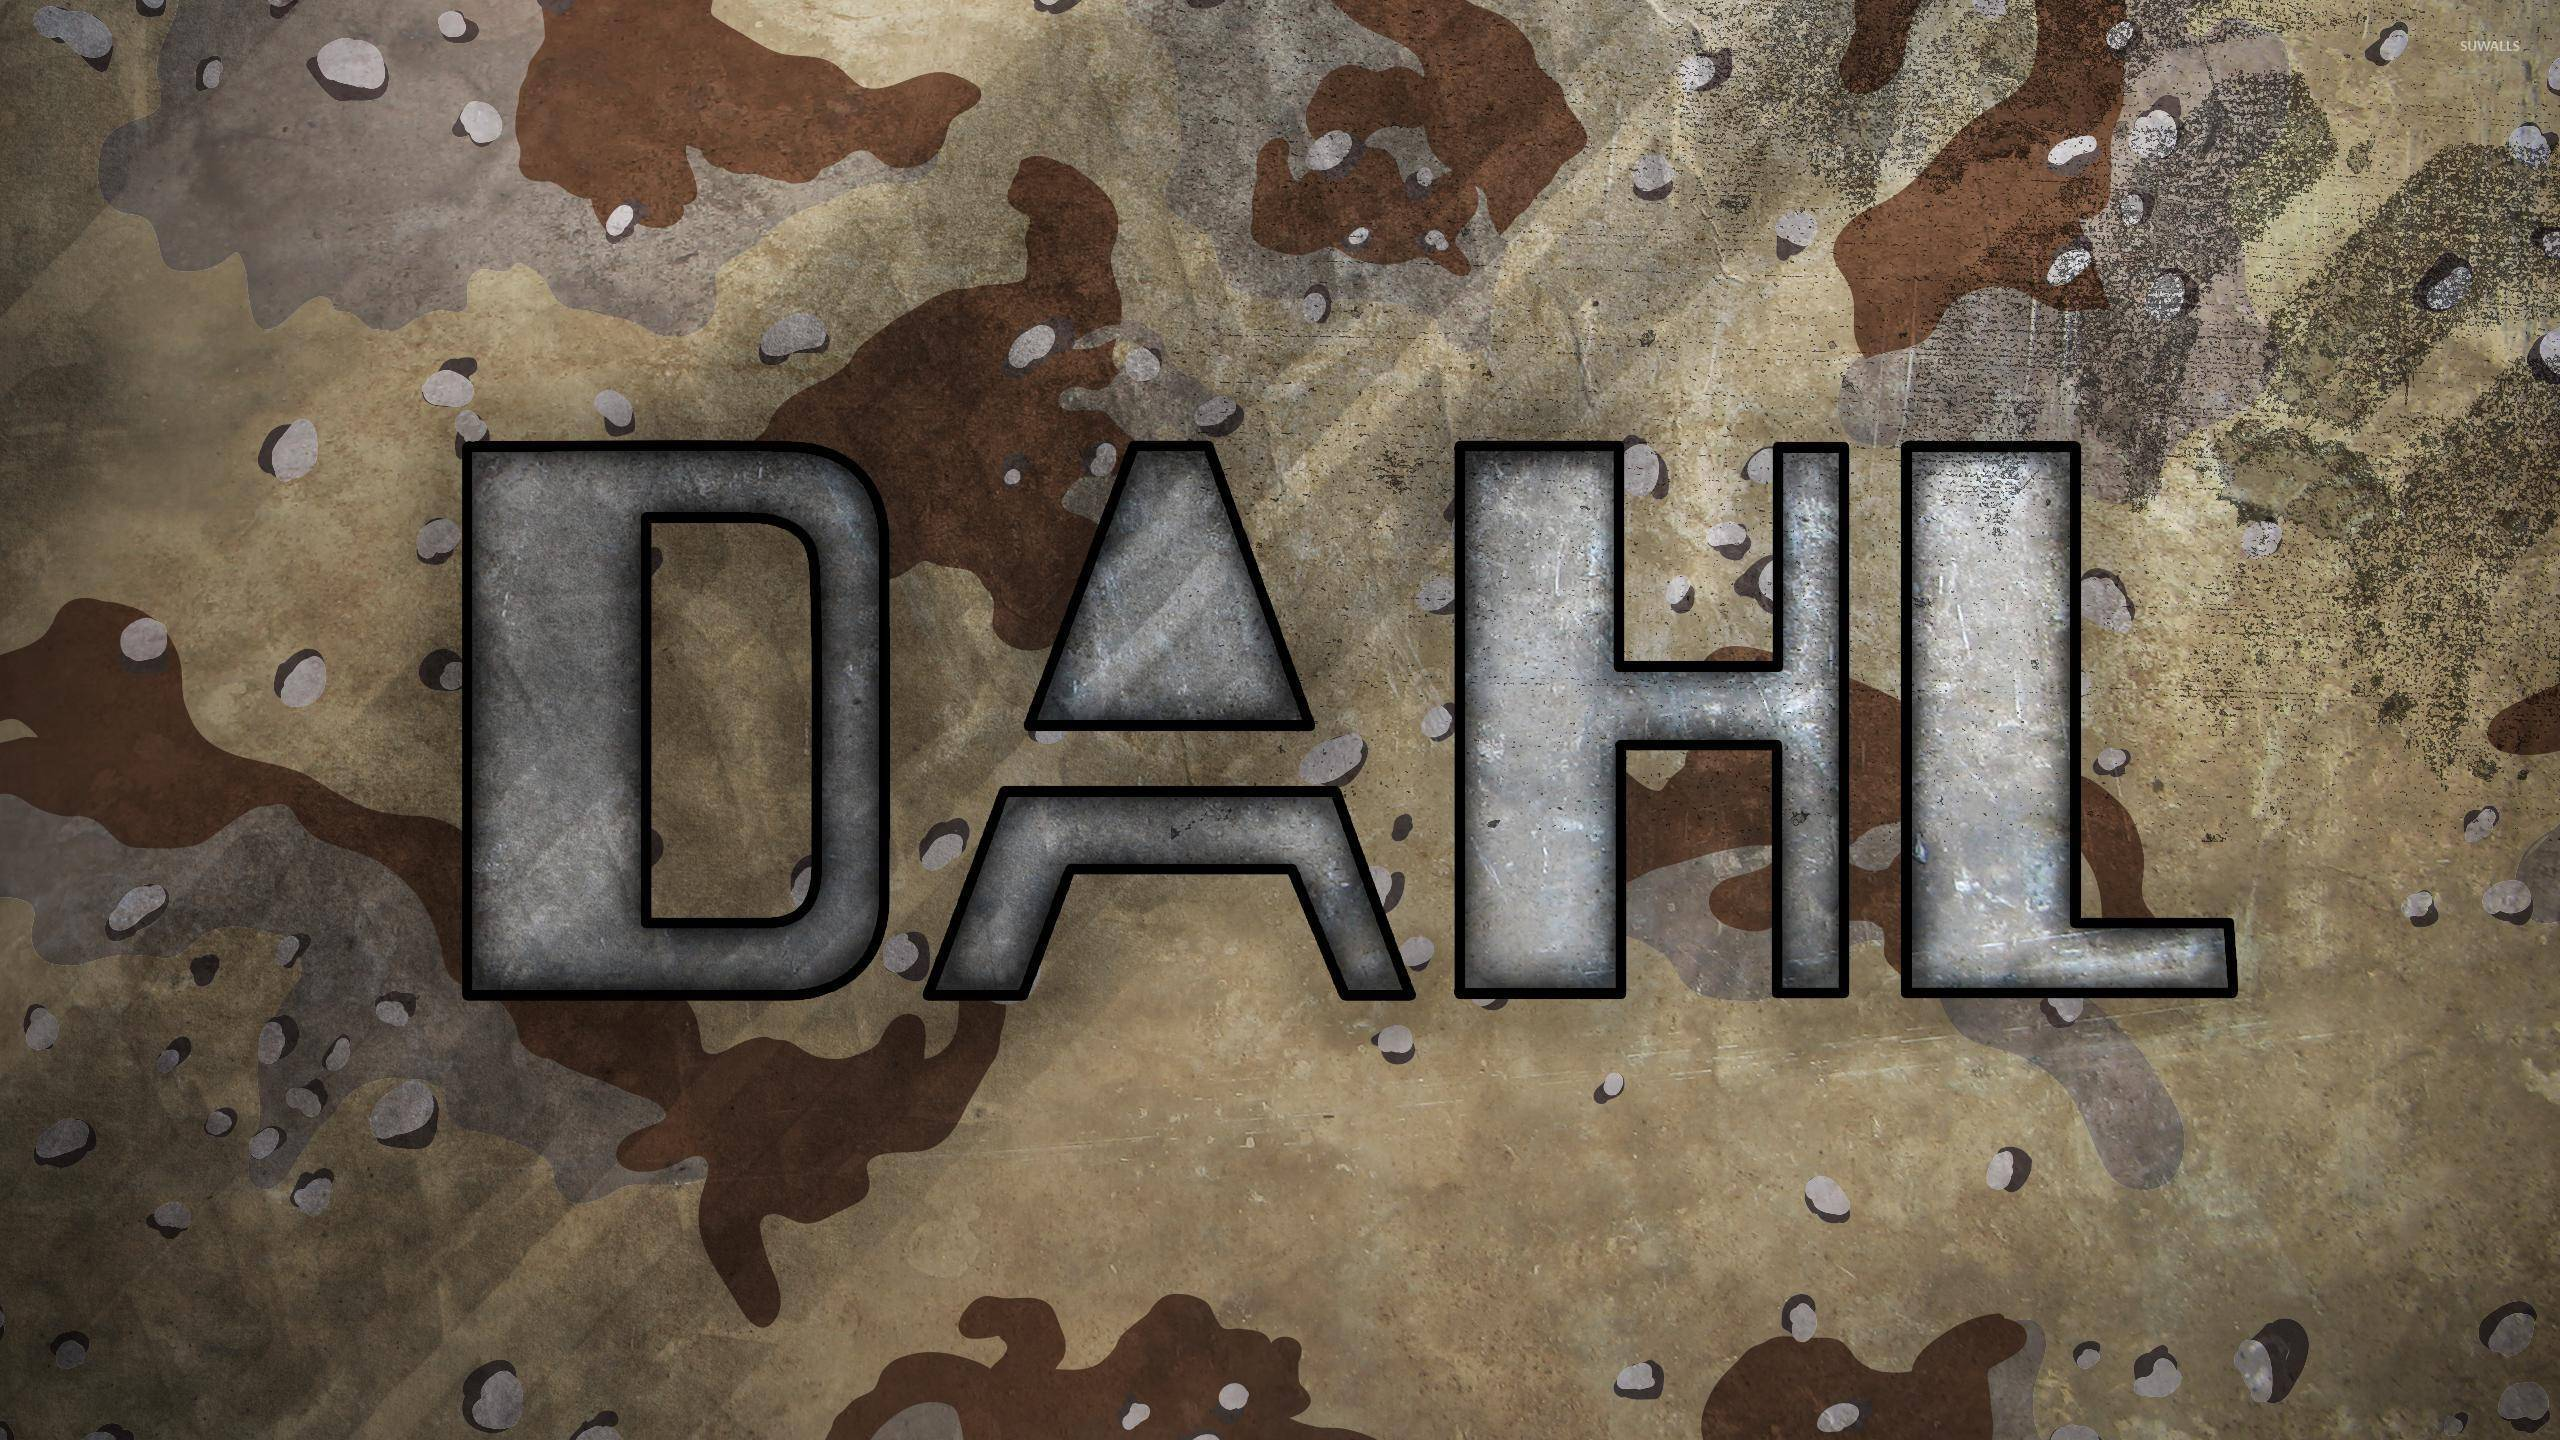 Dahl Borderlands Wallpaper Game Wallpapers 41008